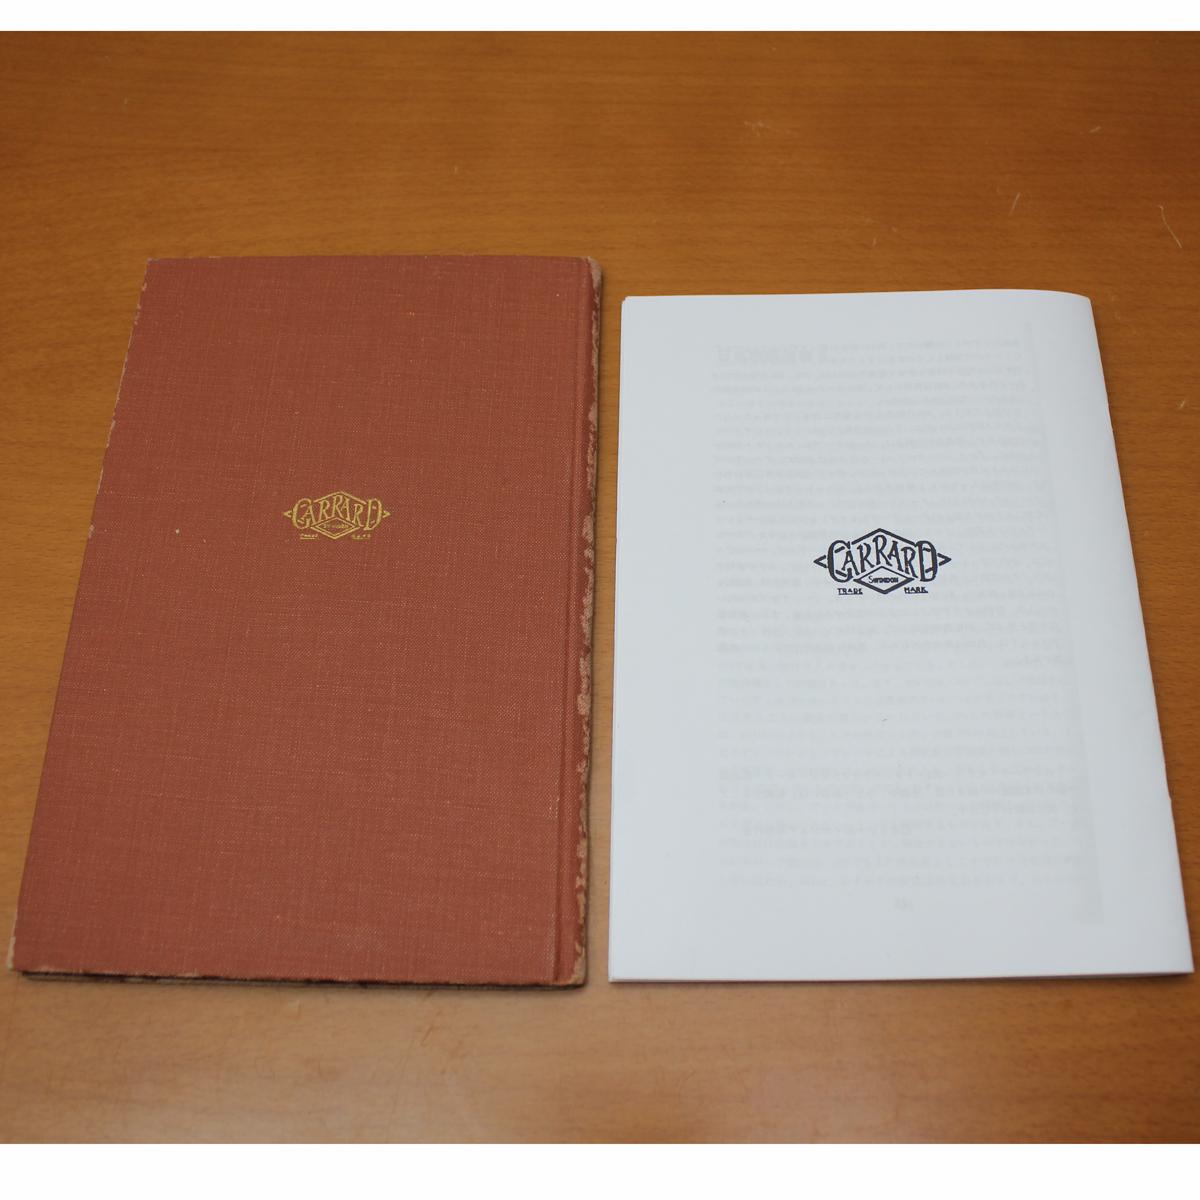 GARRARD301 manual[SN:768○○番台(星7)]ガラード英文取扱説明書 マニュアル おまけ日本語解説コピー付き_画像2